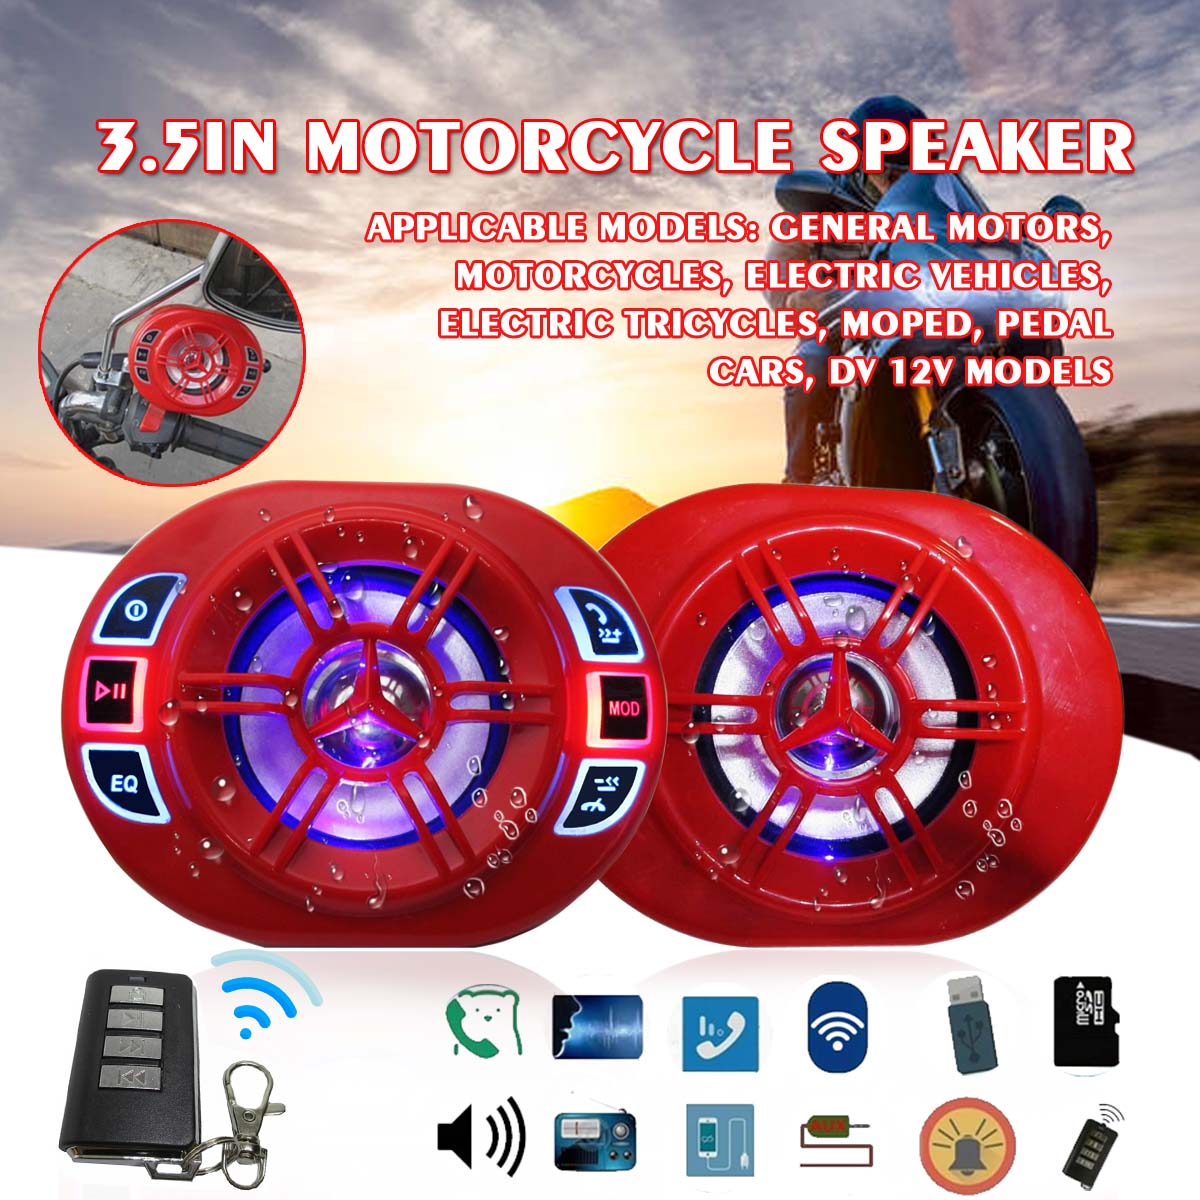 3.5 Inch Motorcycle Bluetooths MP3 Player Red Speaker Waterproof Burglar Alarm Active Call Telegraph Number FM Audio